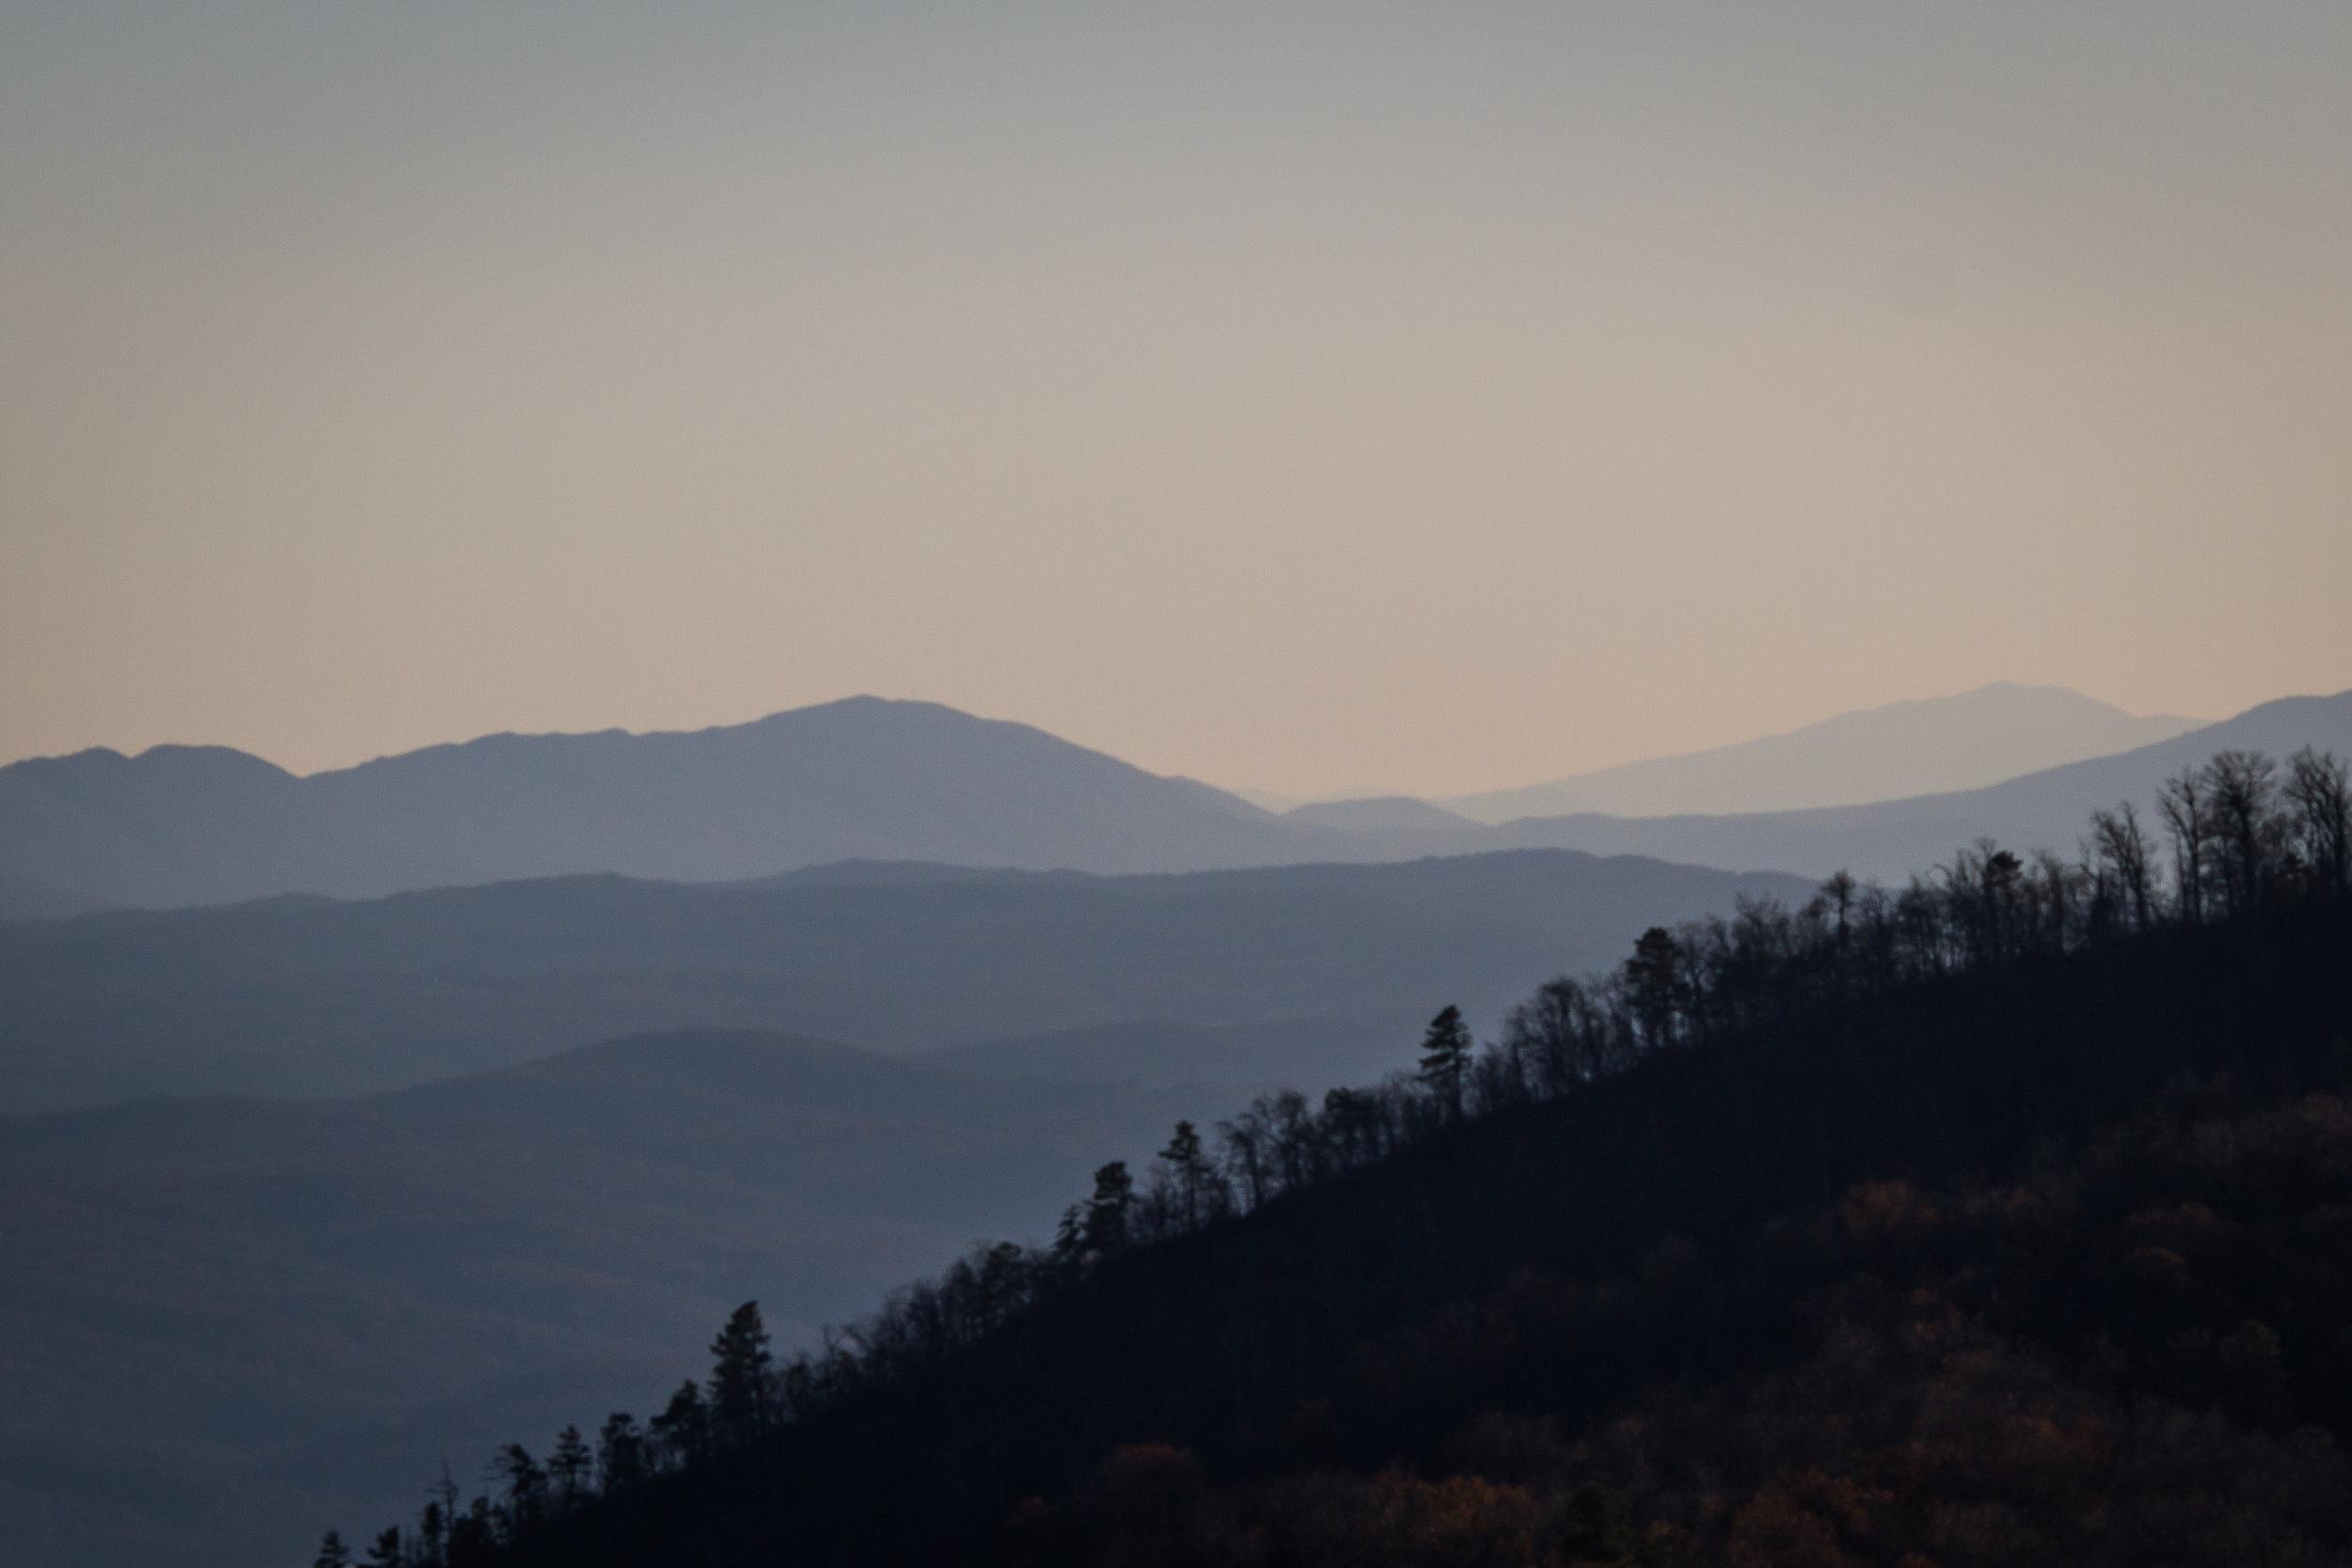 Views from Big Schloss peak, George Washington National Forest